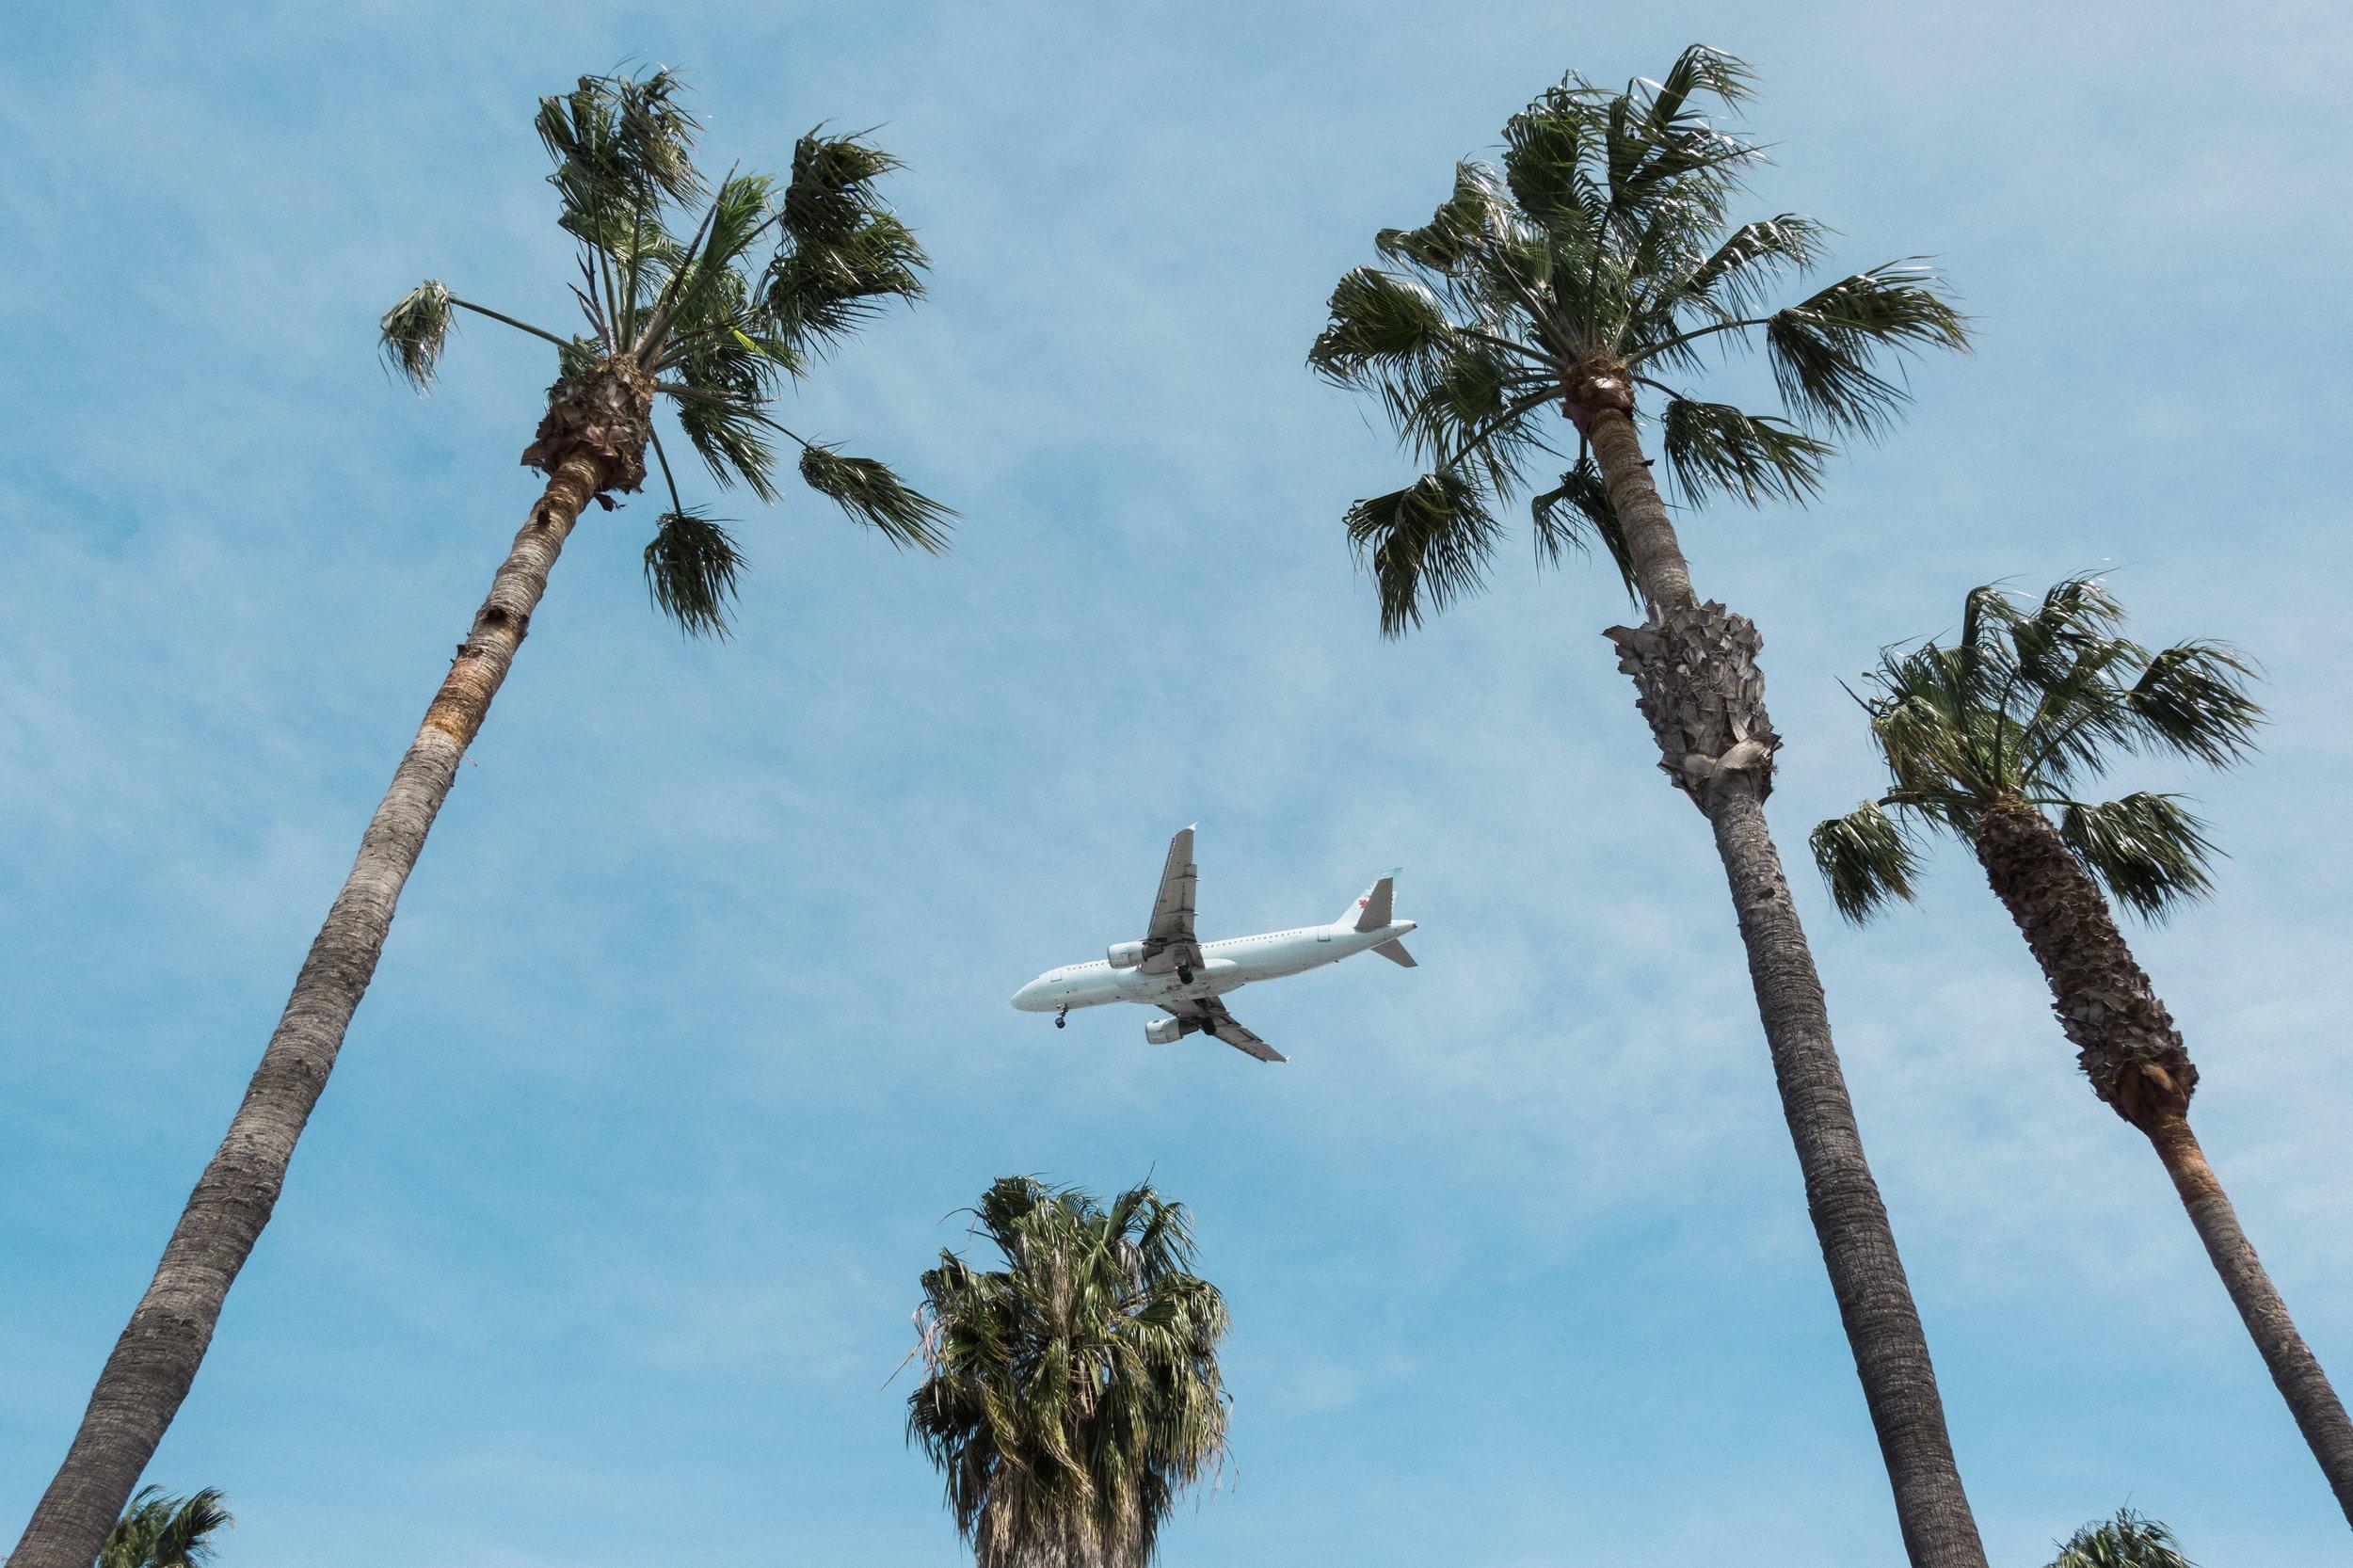 Plane landing near LAX